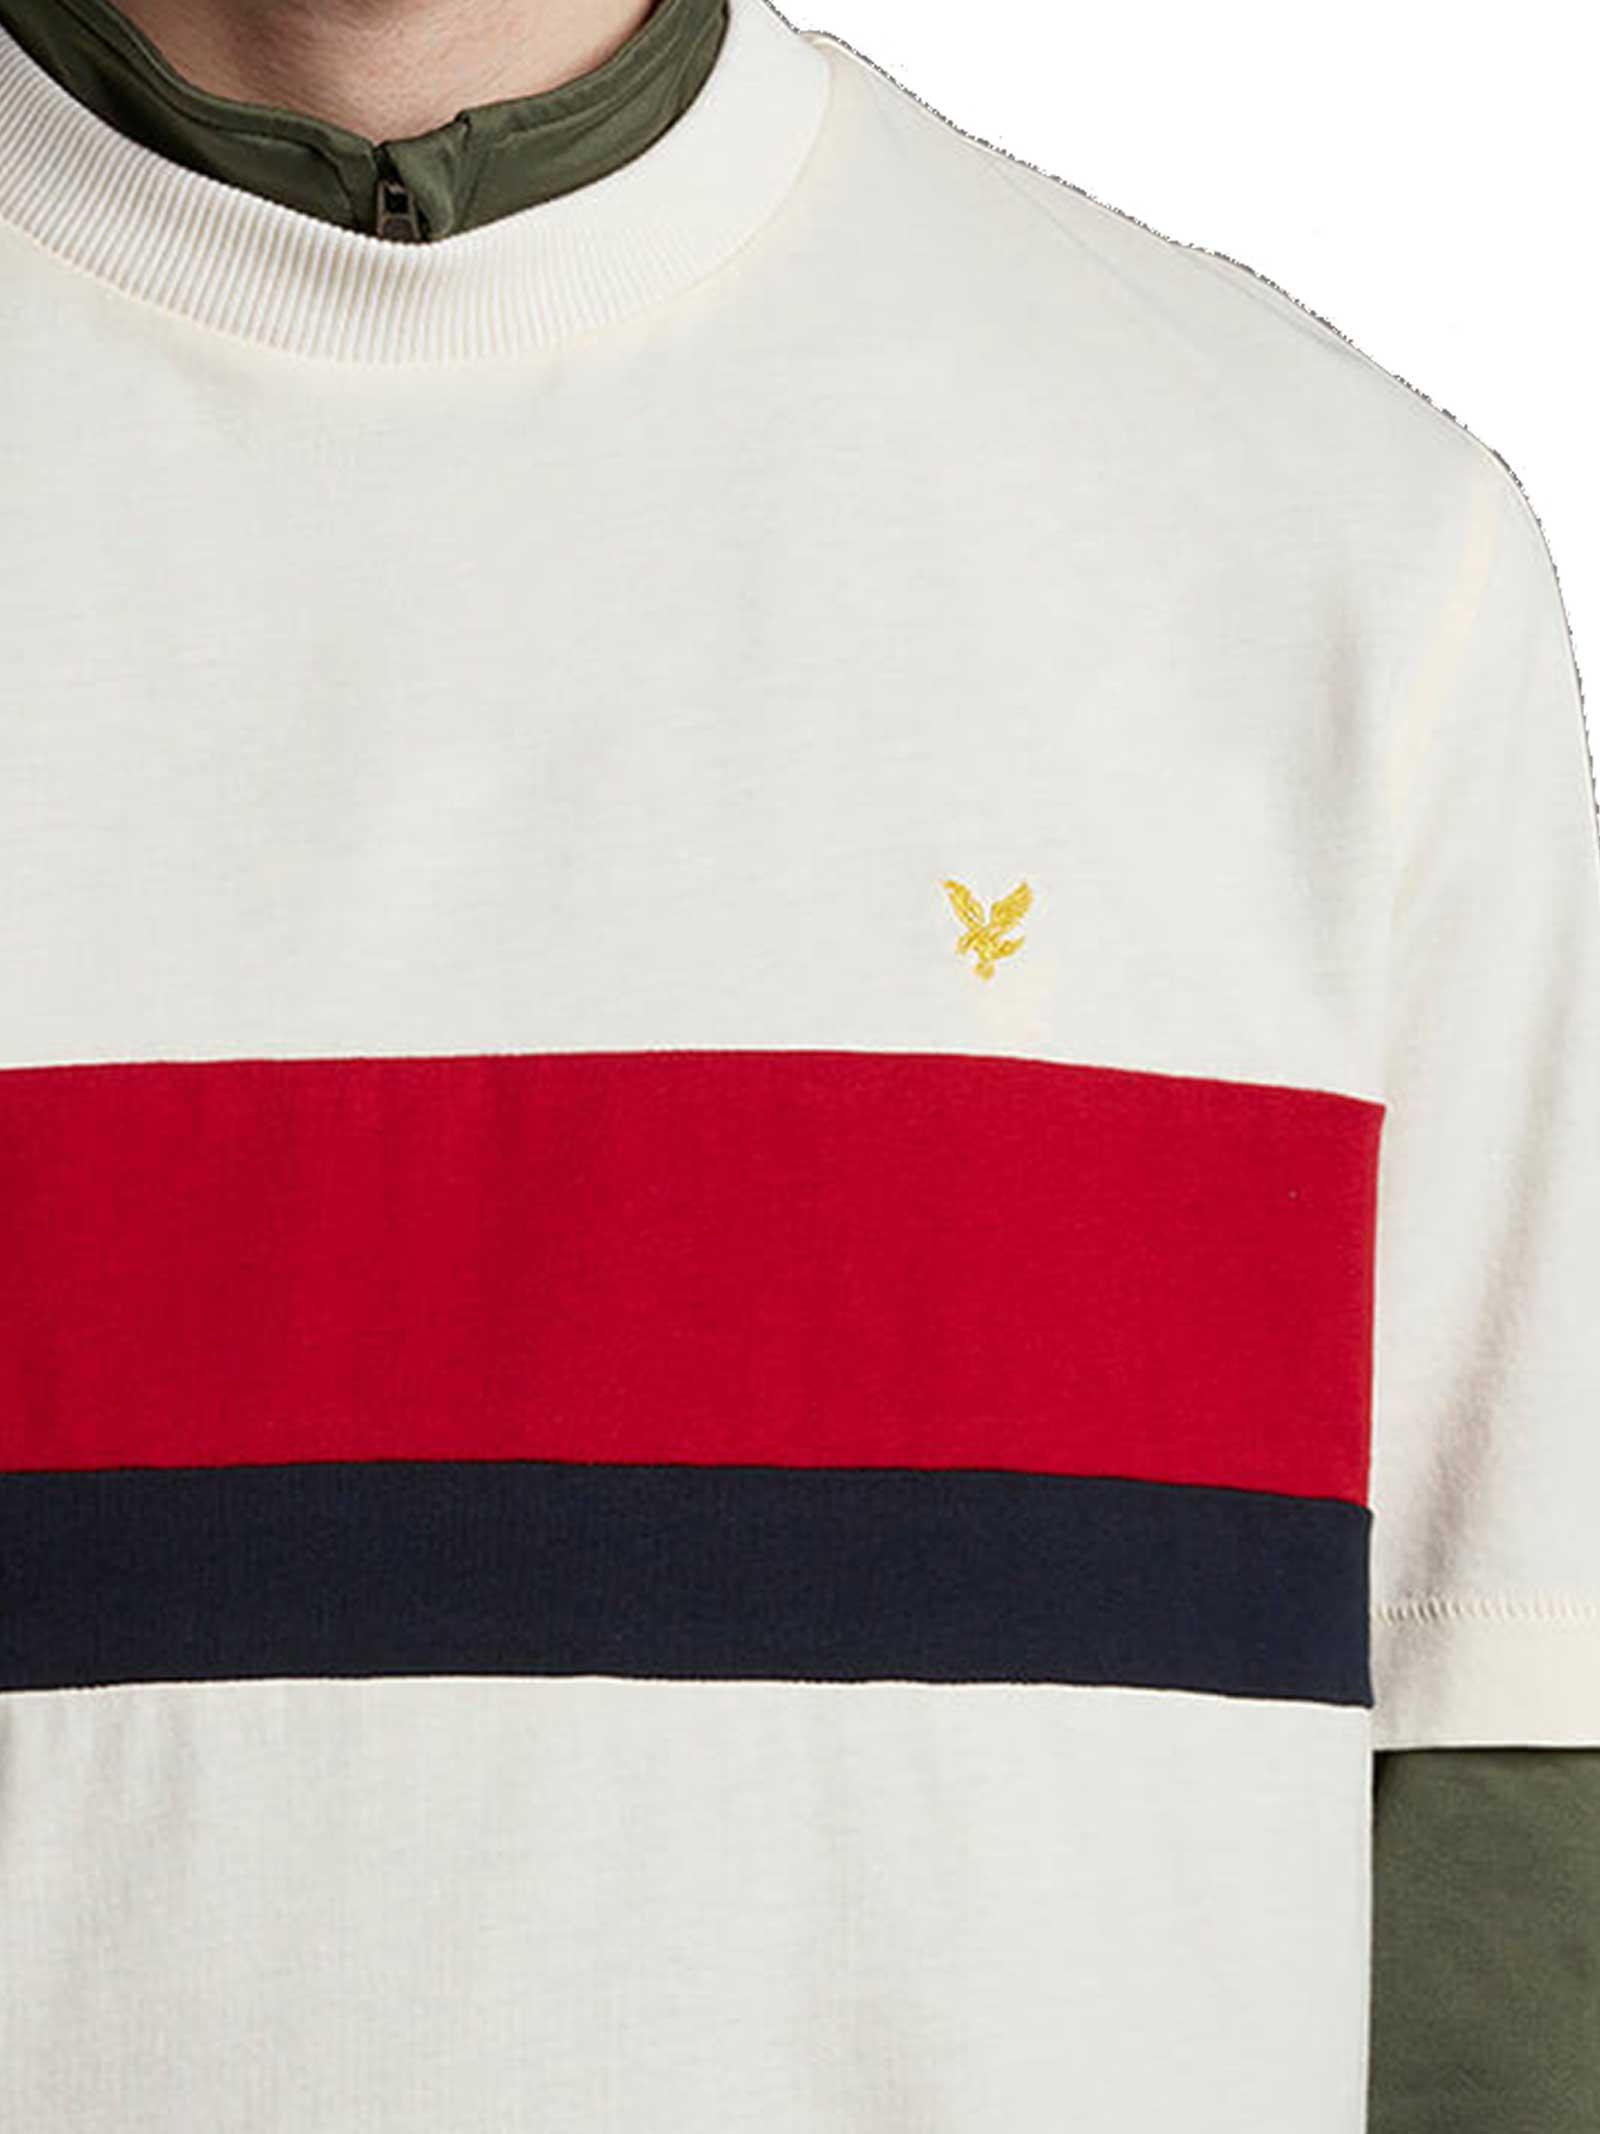 T-SHIRT UOMO LYLE & SCOTT   T-shirt   TS1451VW120